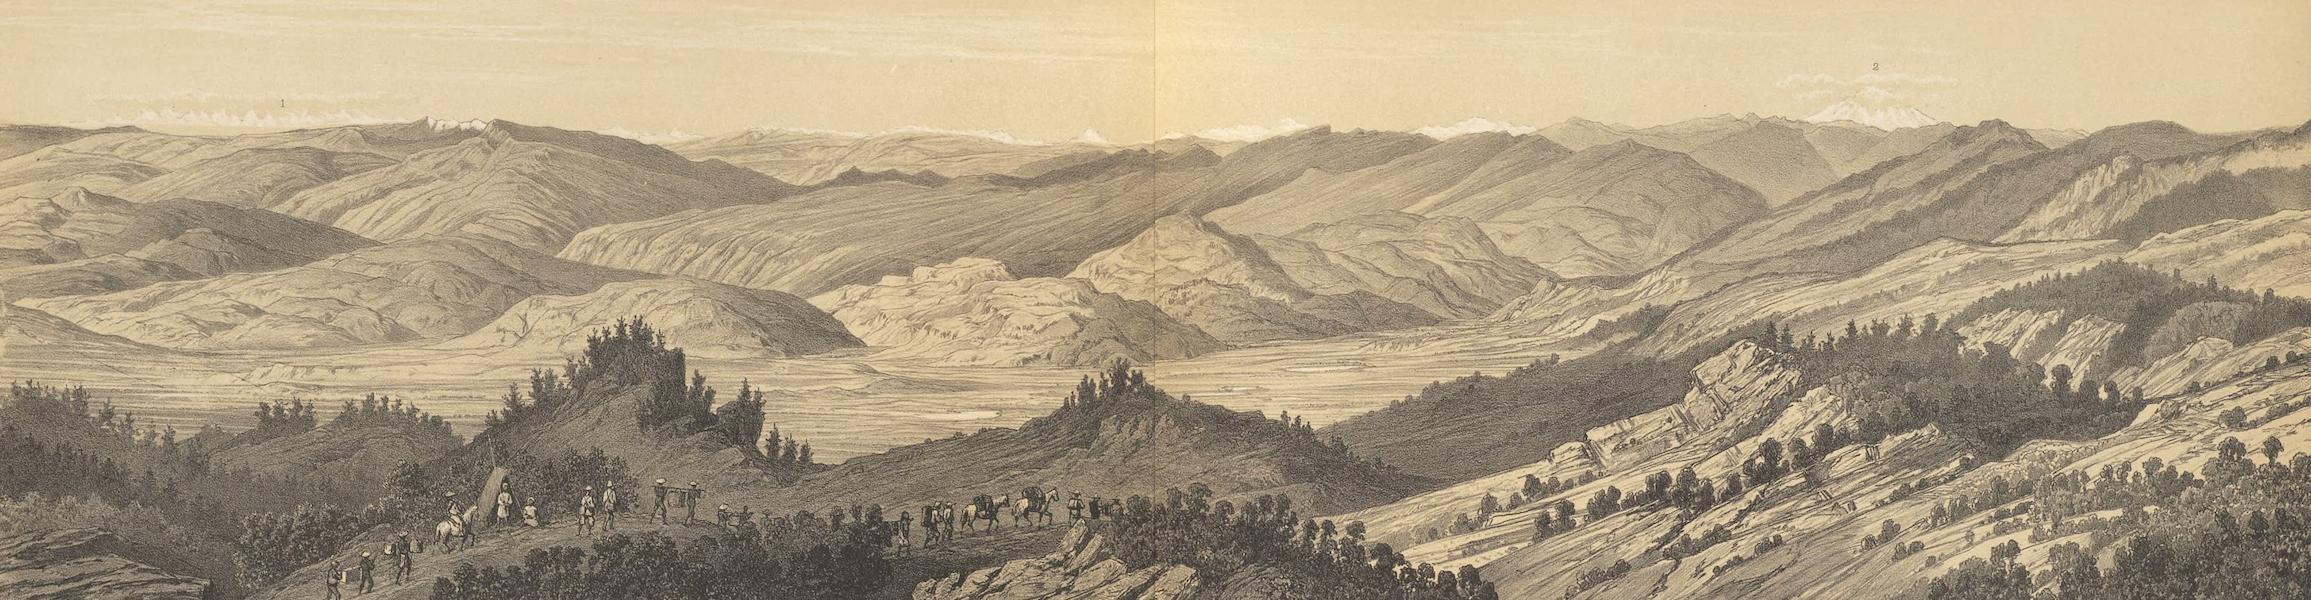 Voyage d'Exploration en Indo-Chine [Atlas-Vol. 1] - Panorama Pris Entre Houey-Li Tcheou et Che-Lang-Ko (1873)